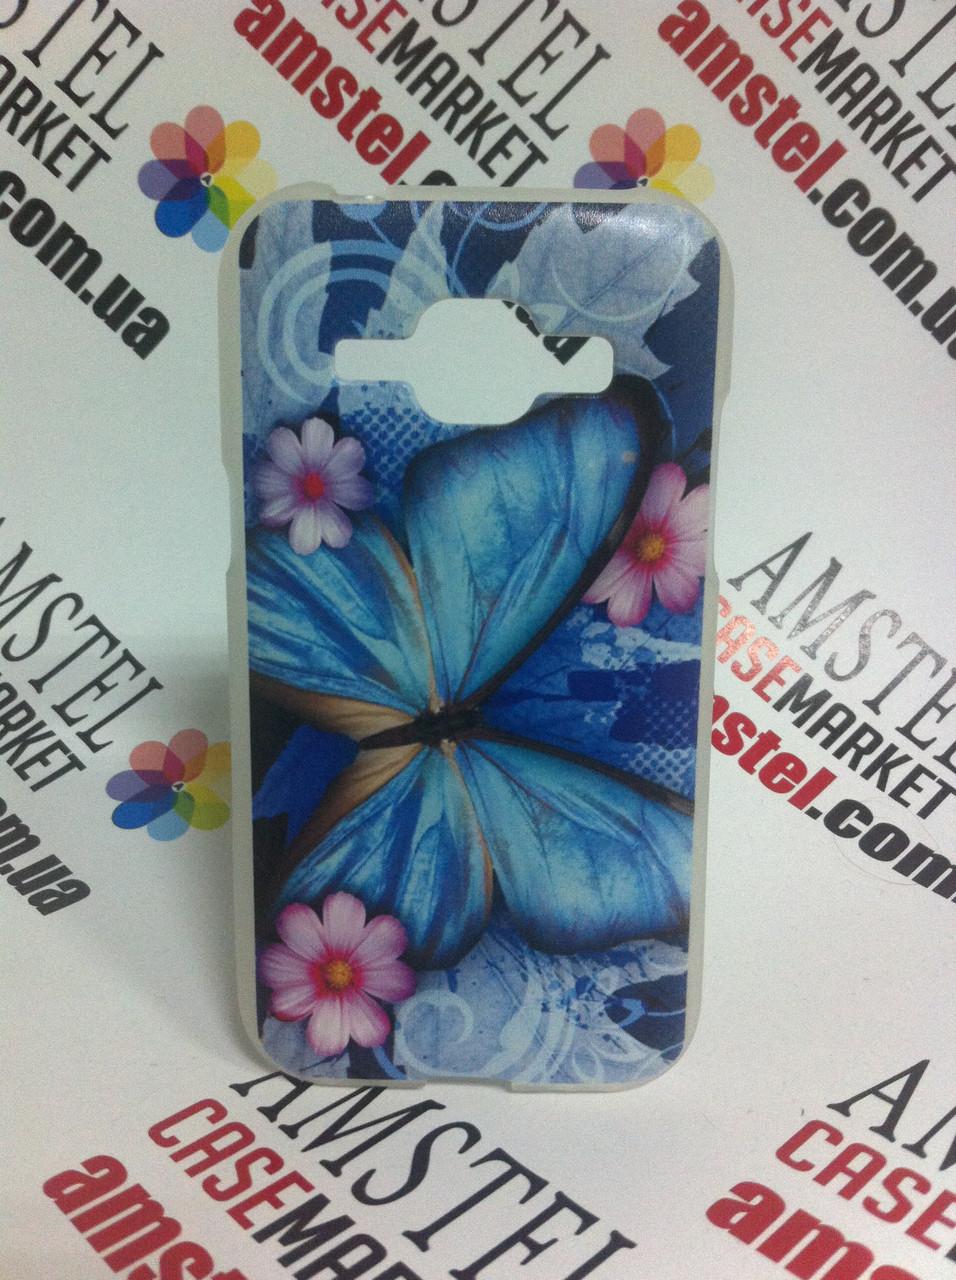 Чехол для Samsung Galaxy J1 J100 с картинкой -  Бабочка на цветах